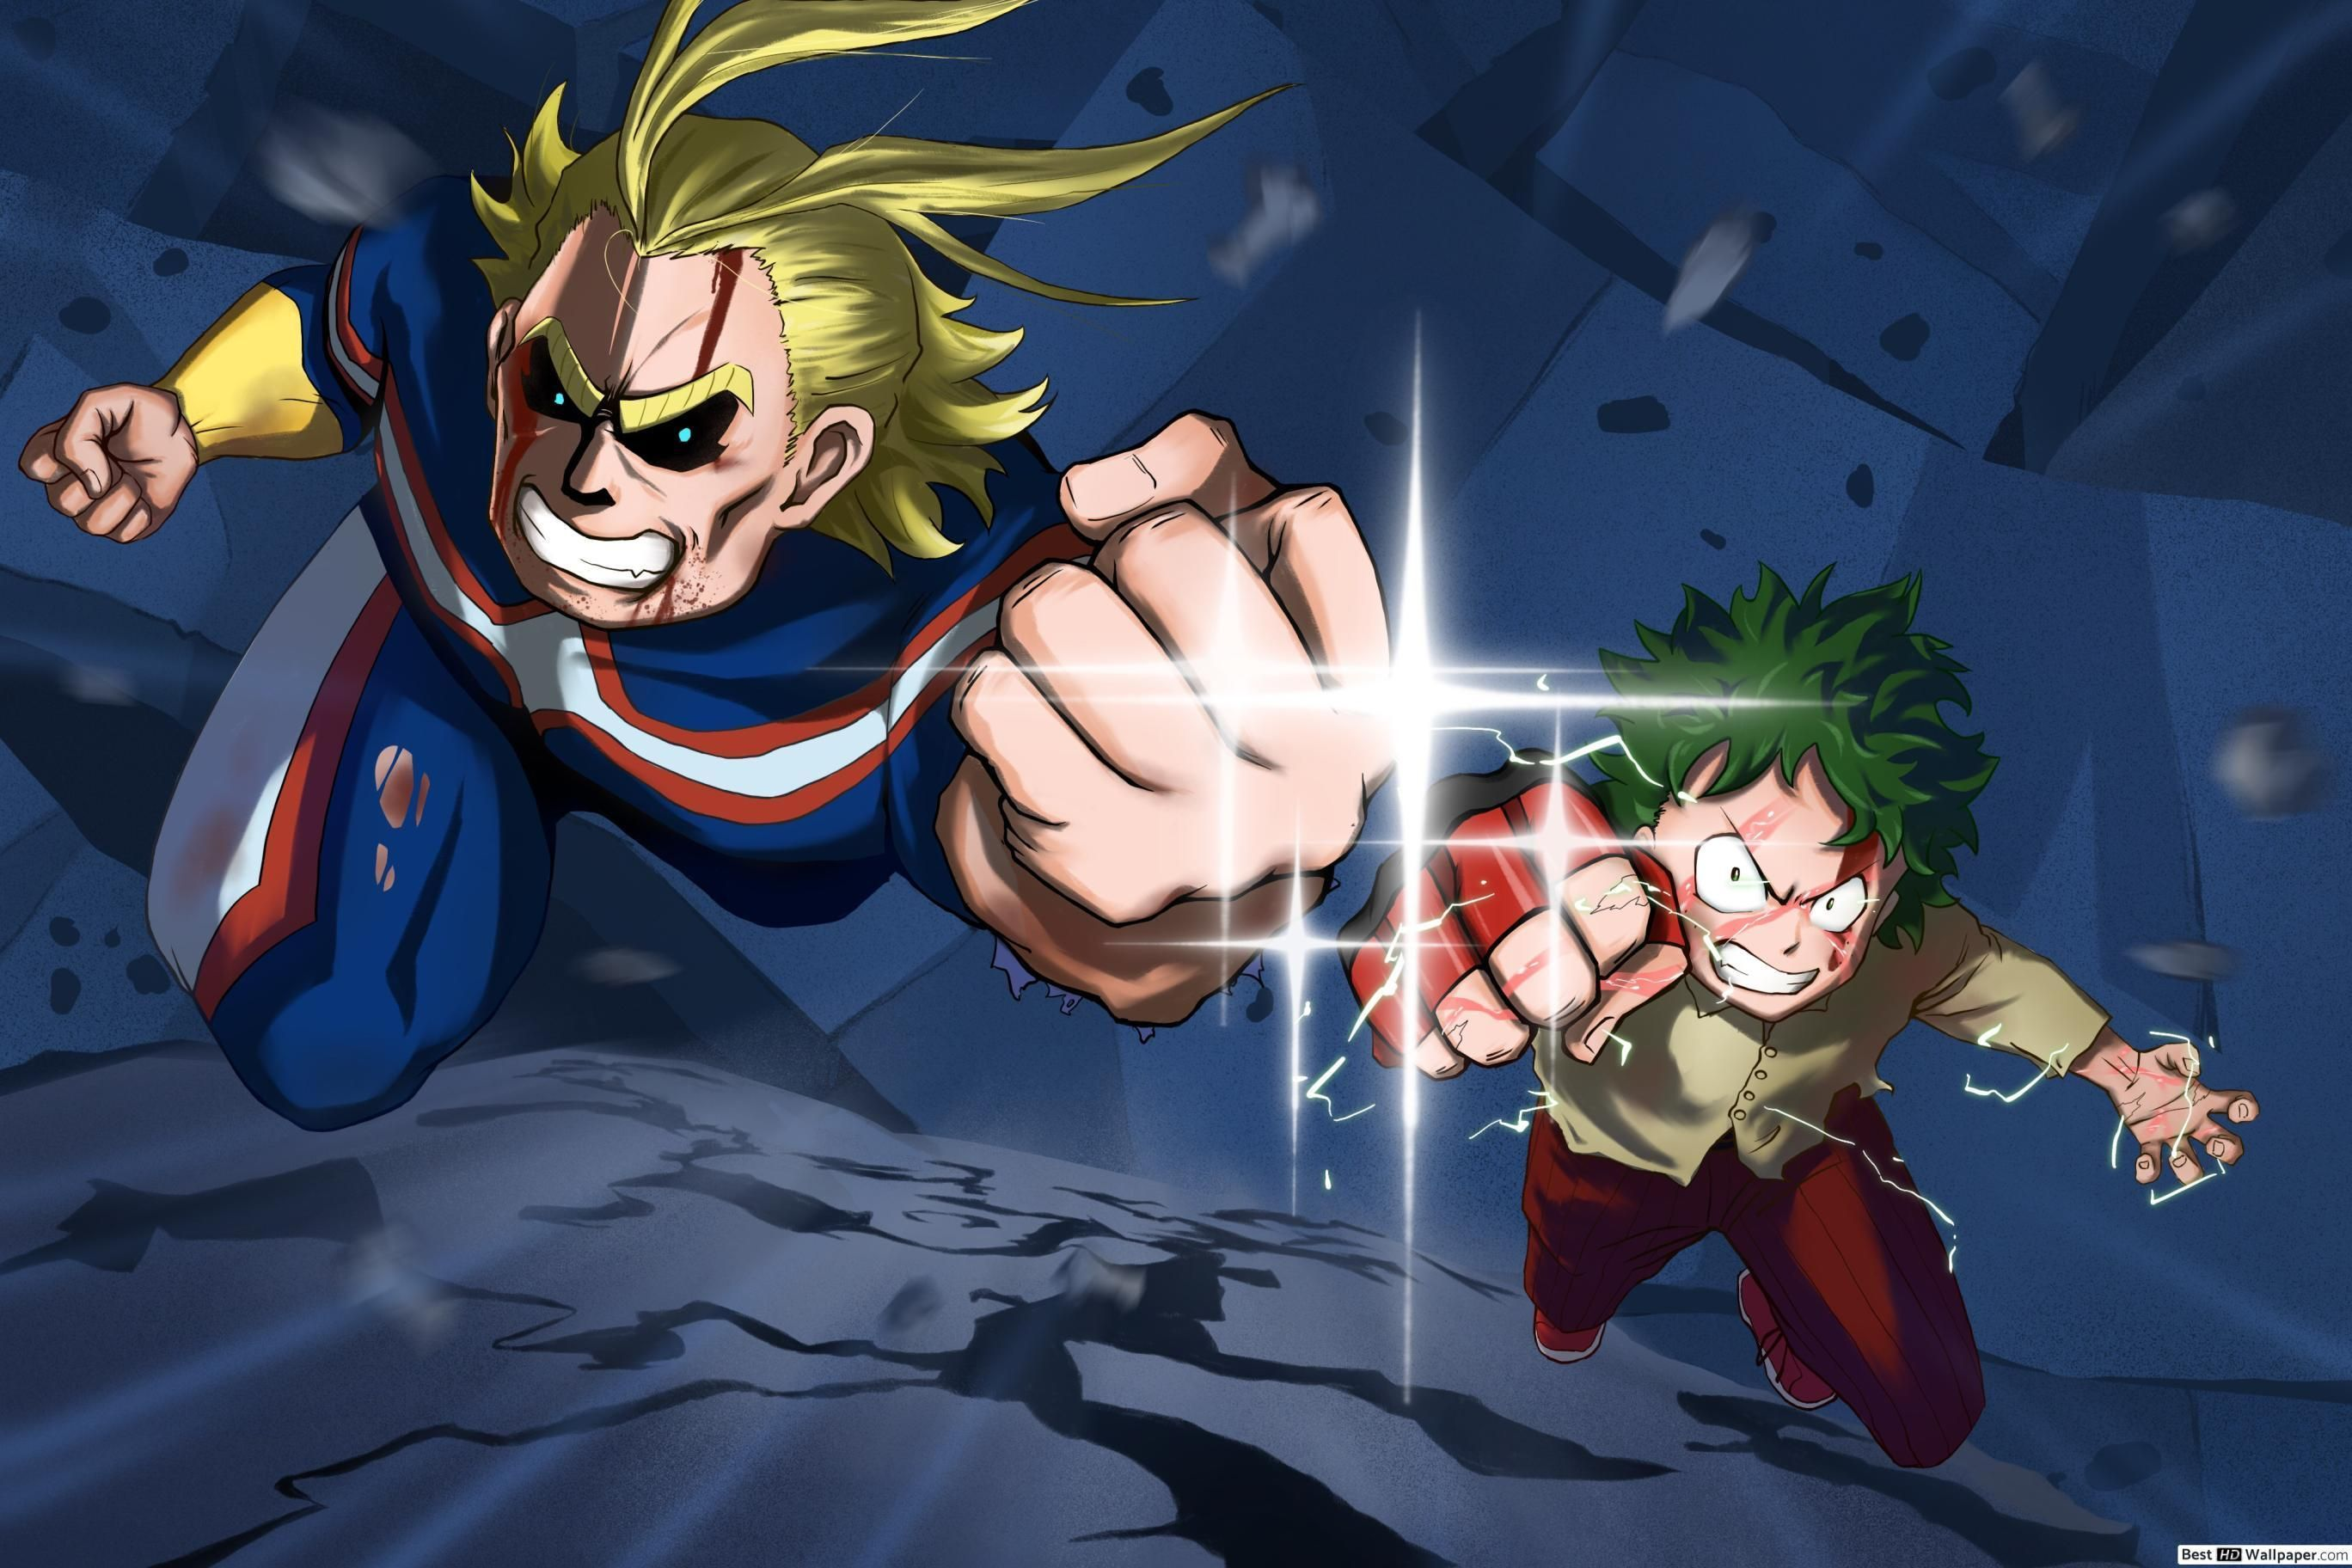 Hd Wallpaper Anime My Hero Academia Izuku Midoriya Wallpaper Flare My Hero My Hero Academia Character Wallpaper